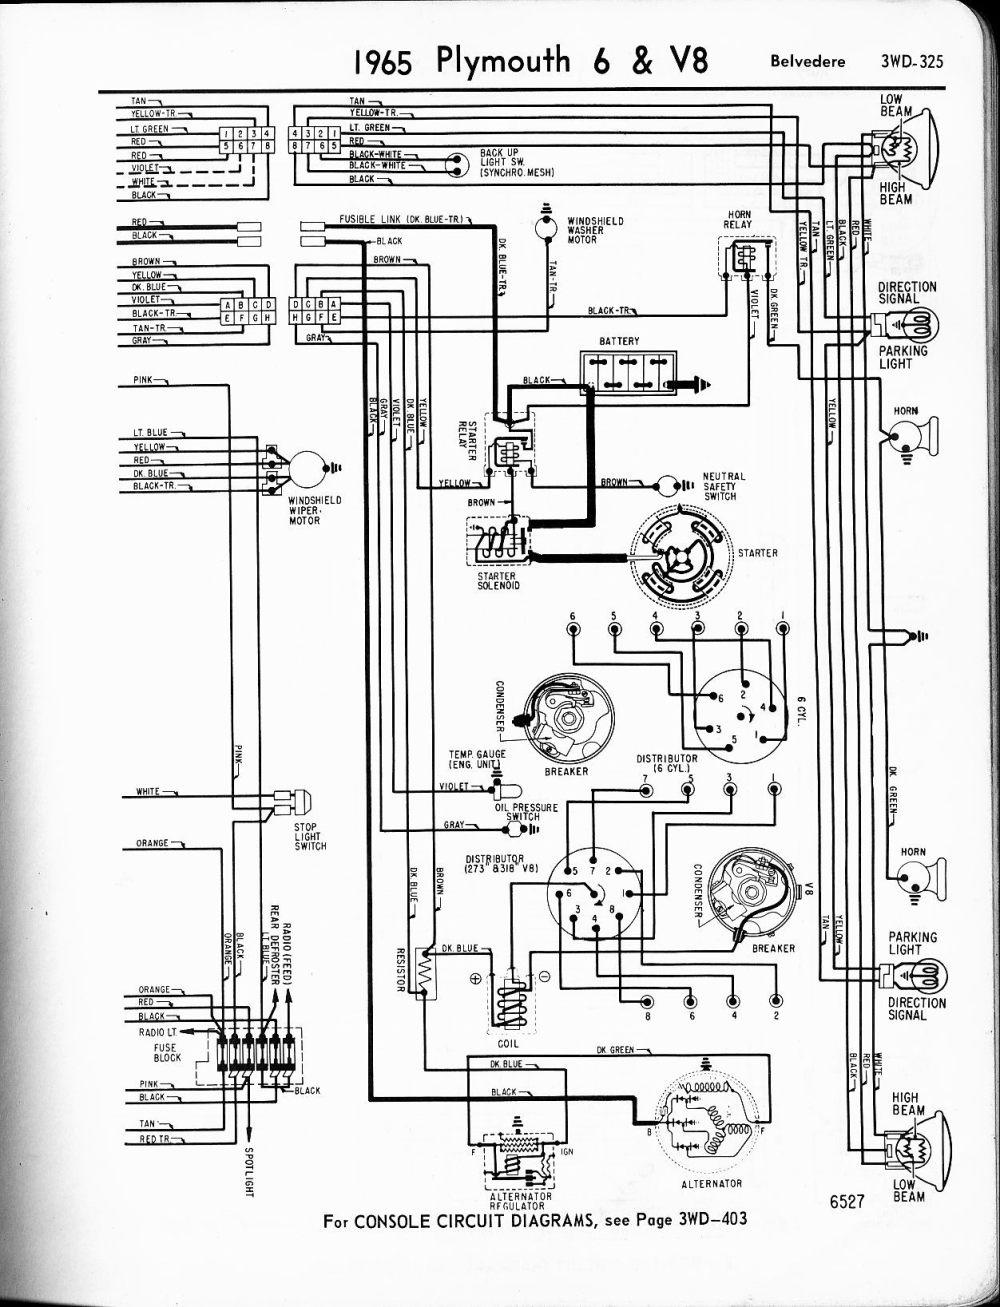 plymouth alternator wiring diagram cx 6246  1965 plymouth barracuda valiant 11quot x 17quot color  valiant 11quot x 17quot color